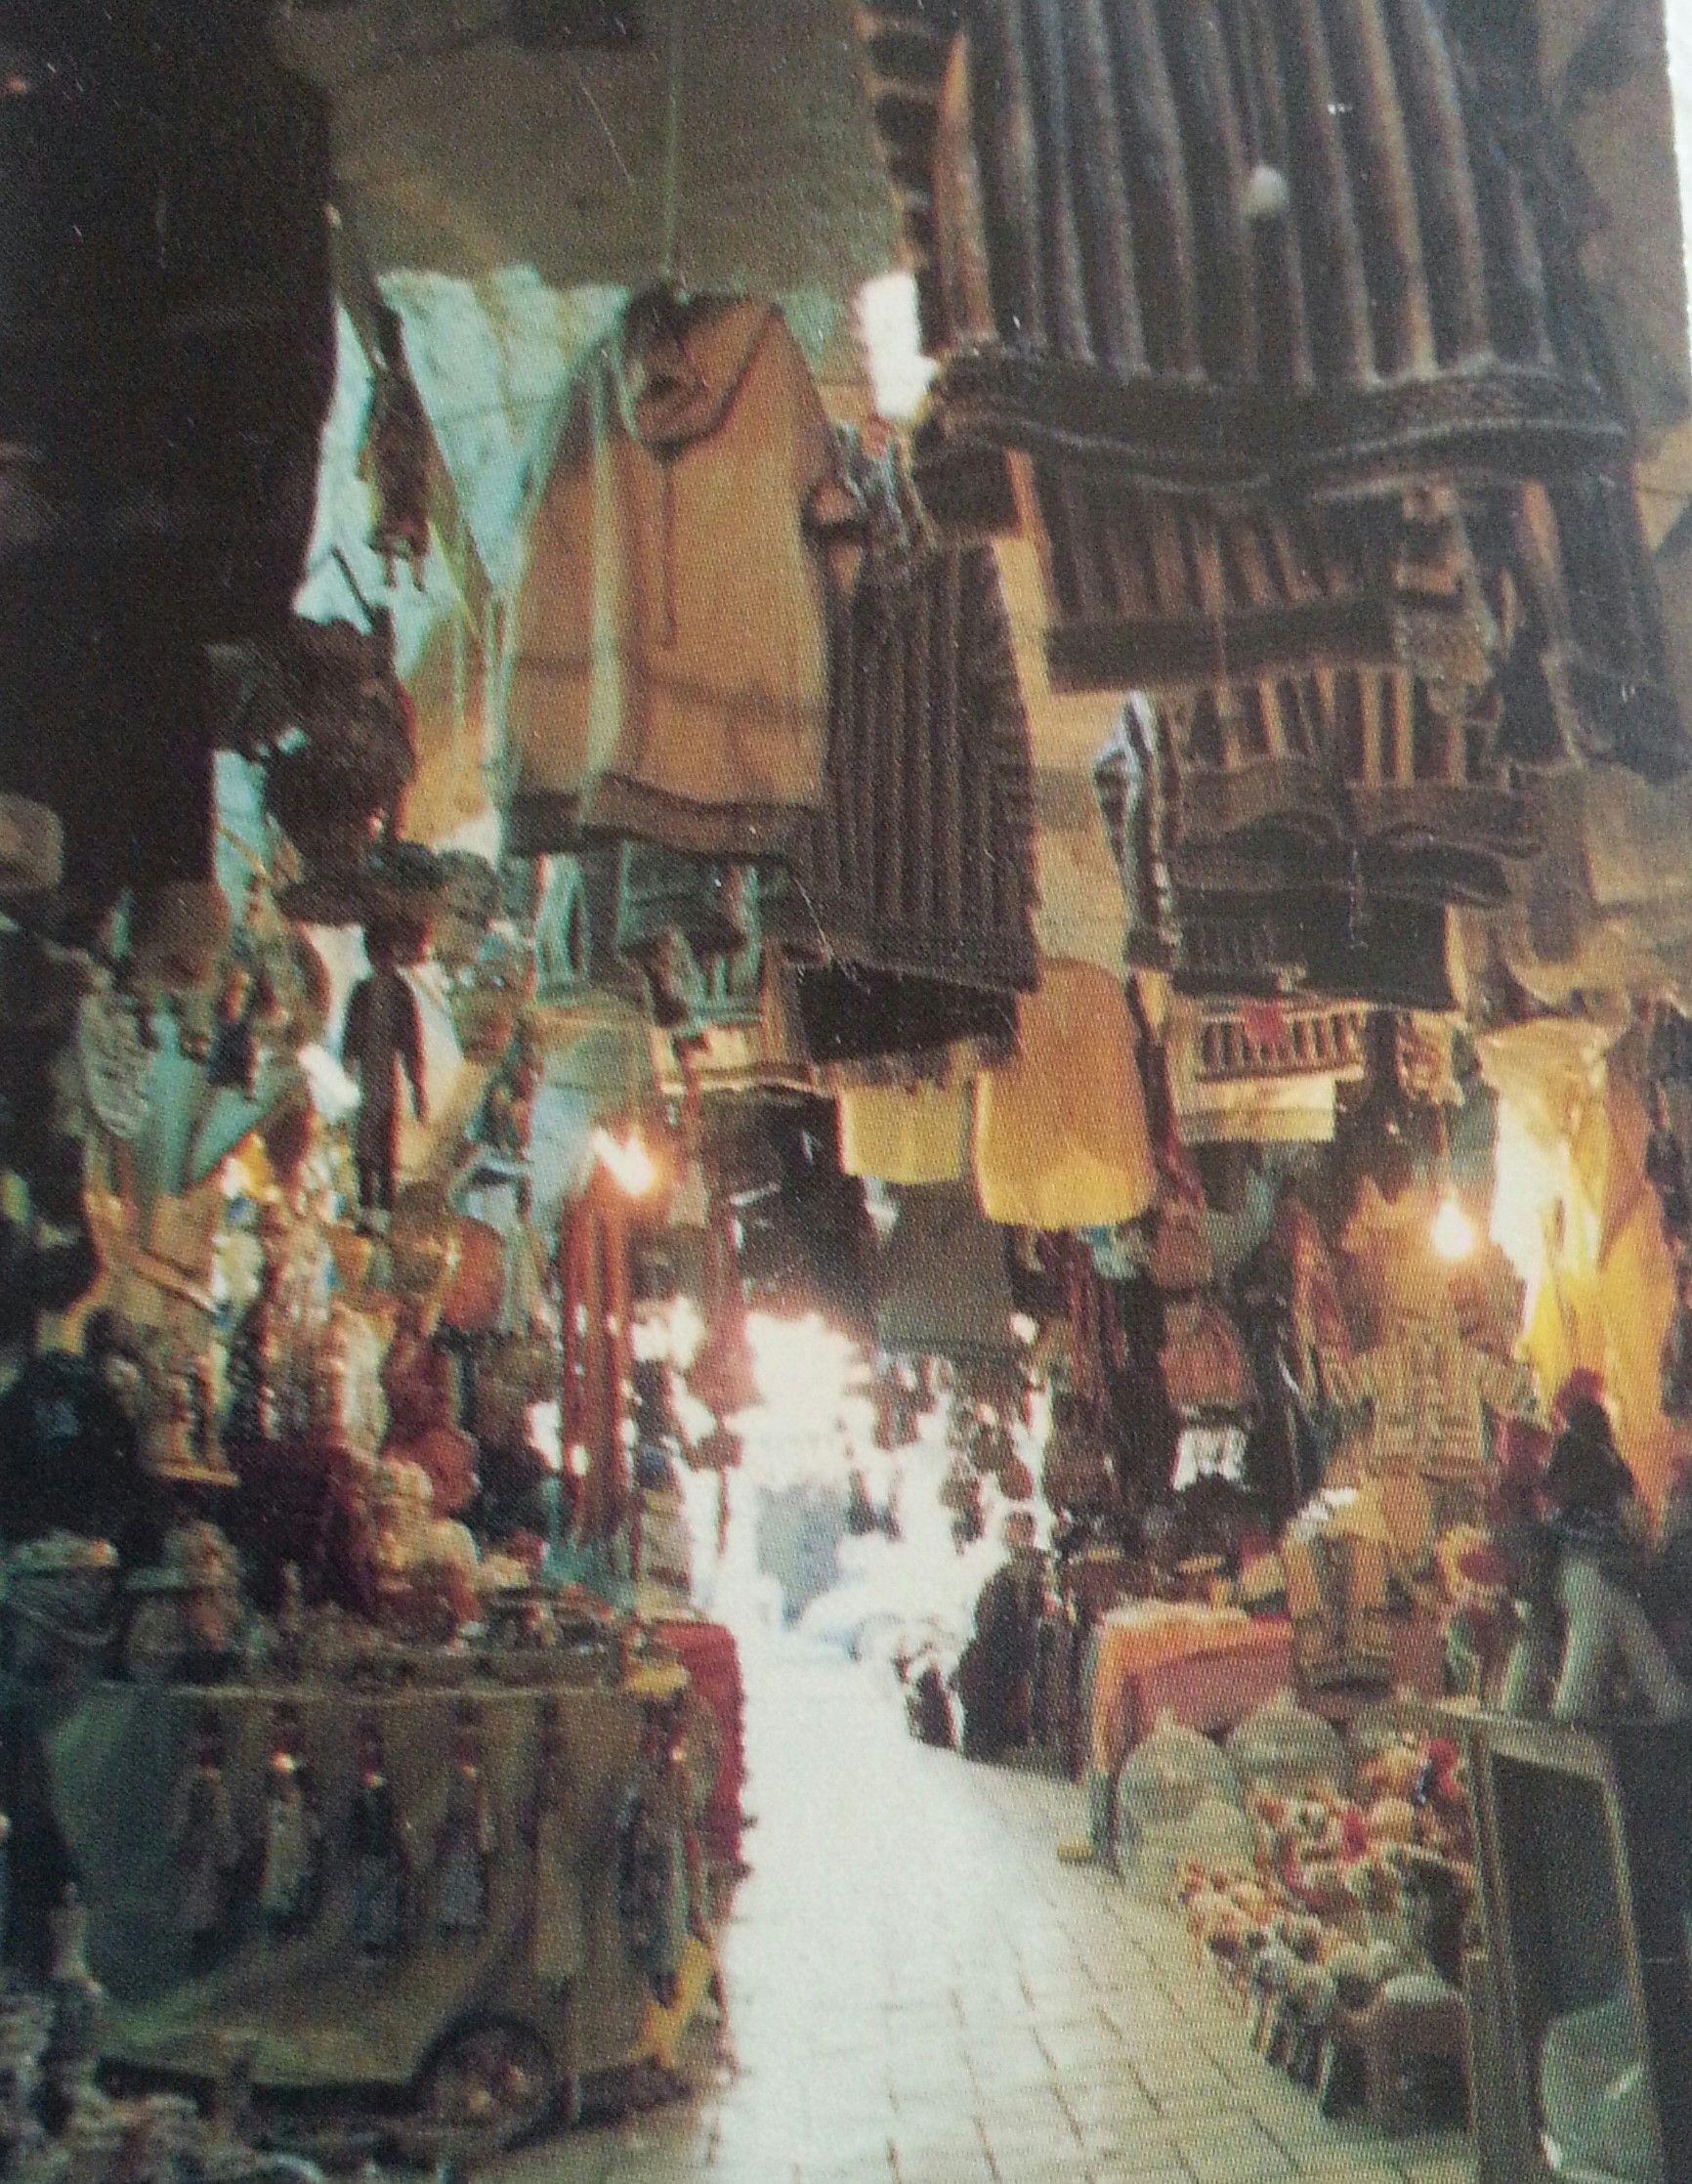 Souk de Nabeuf (Tunisie)